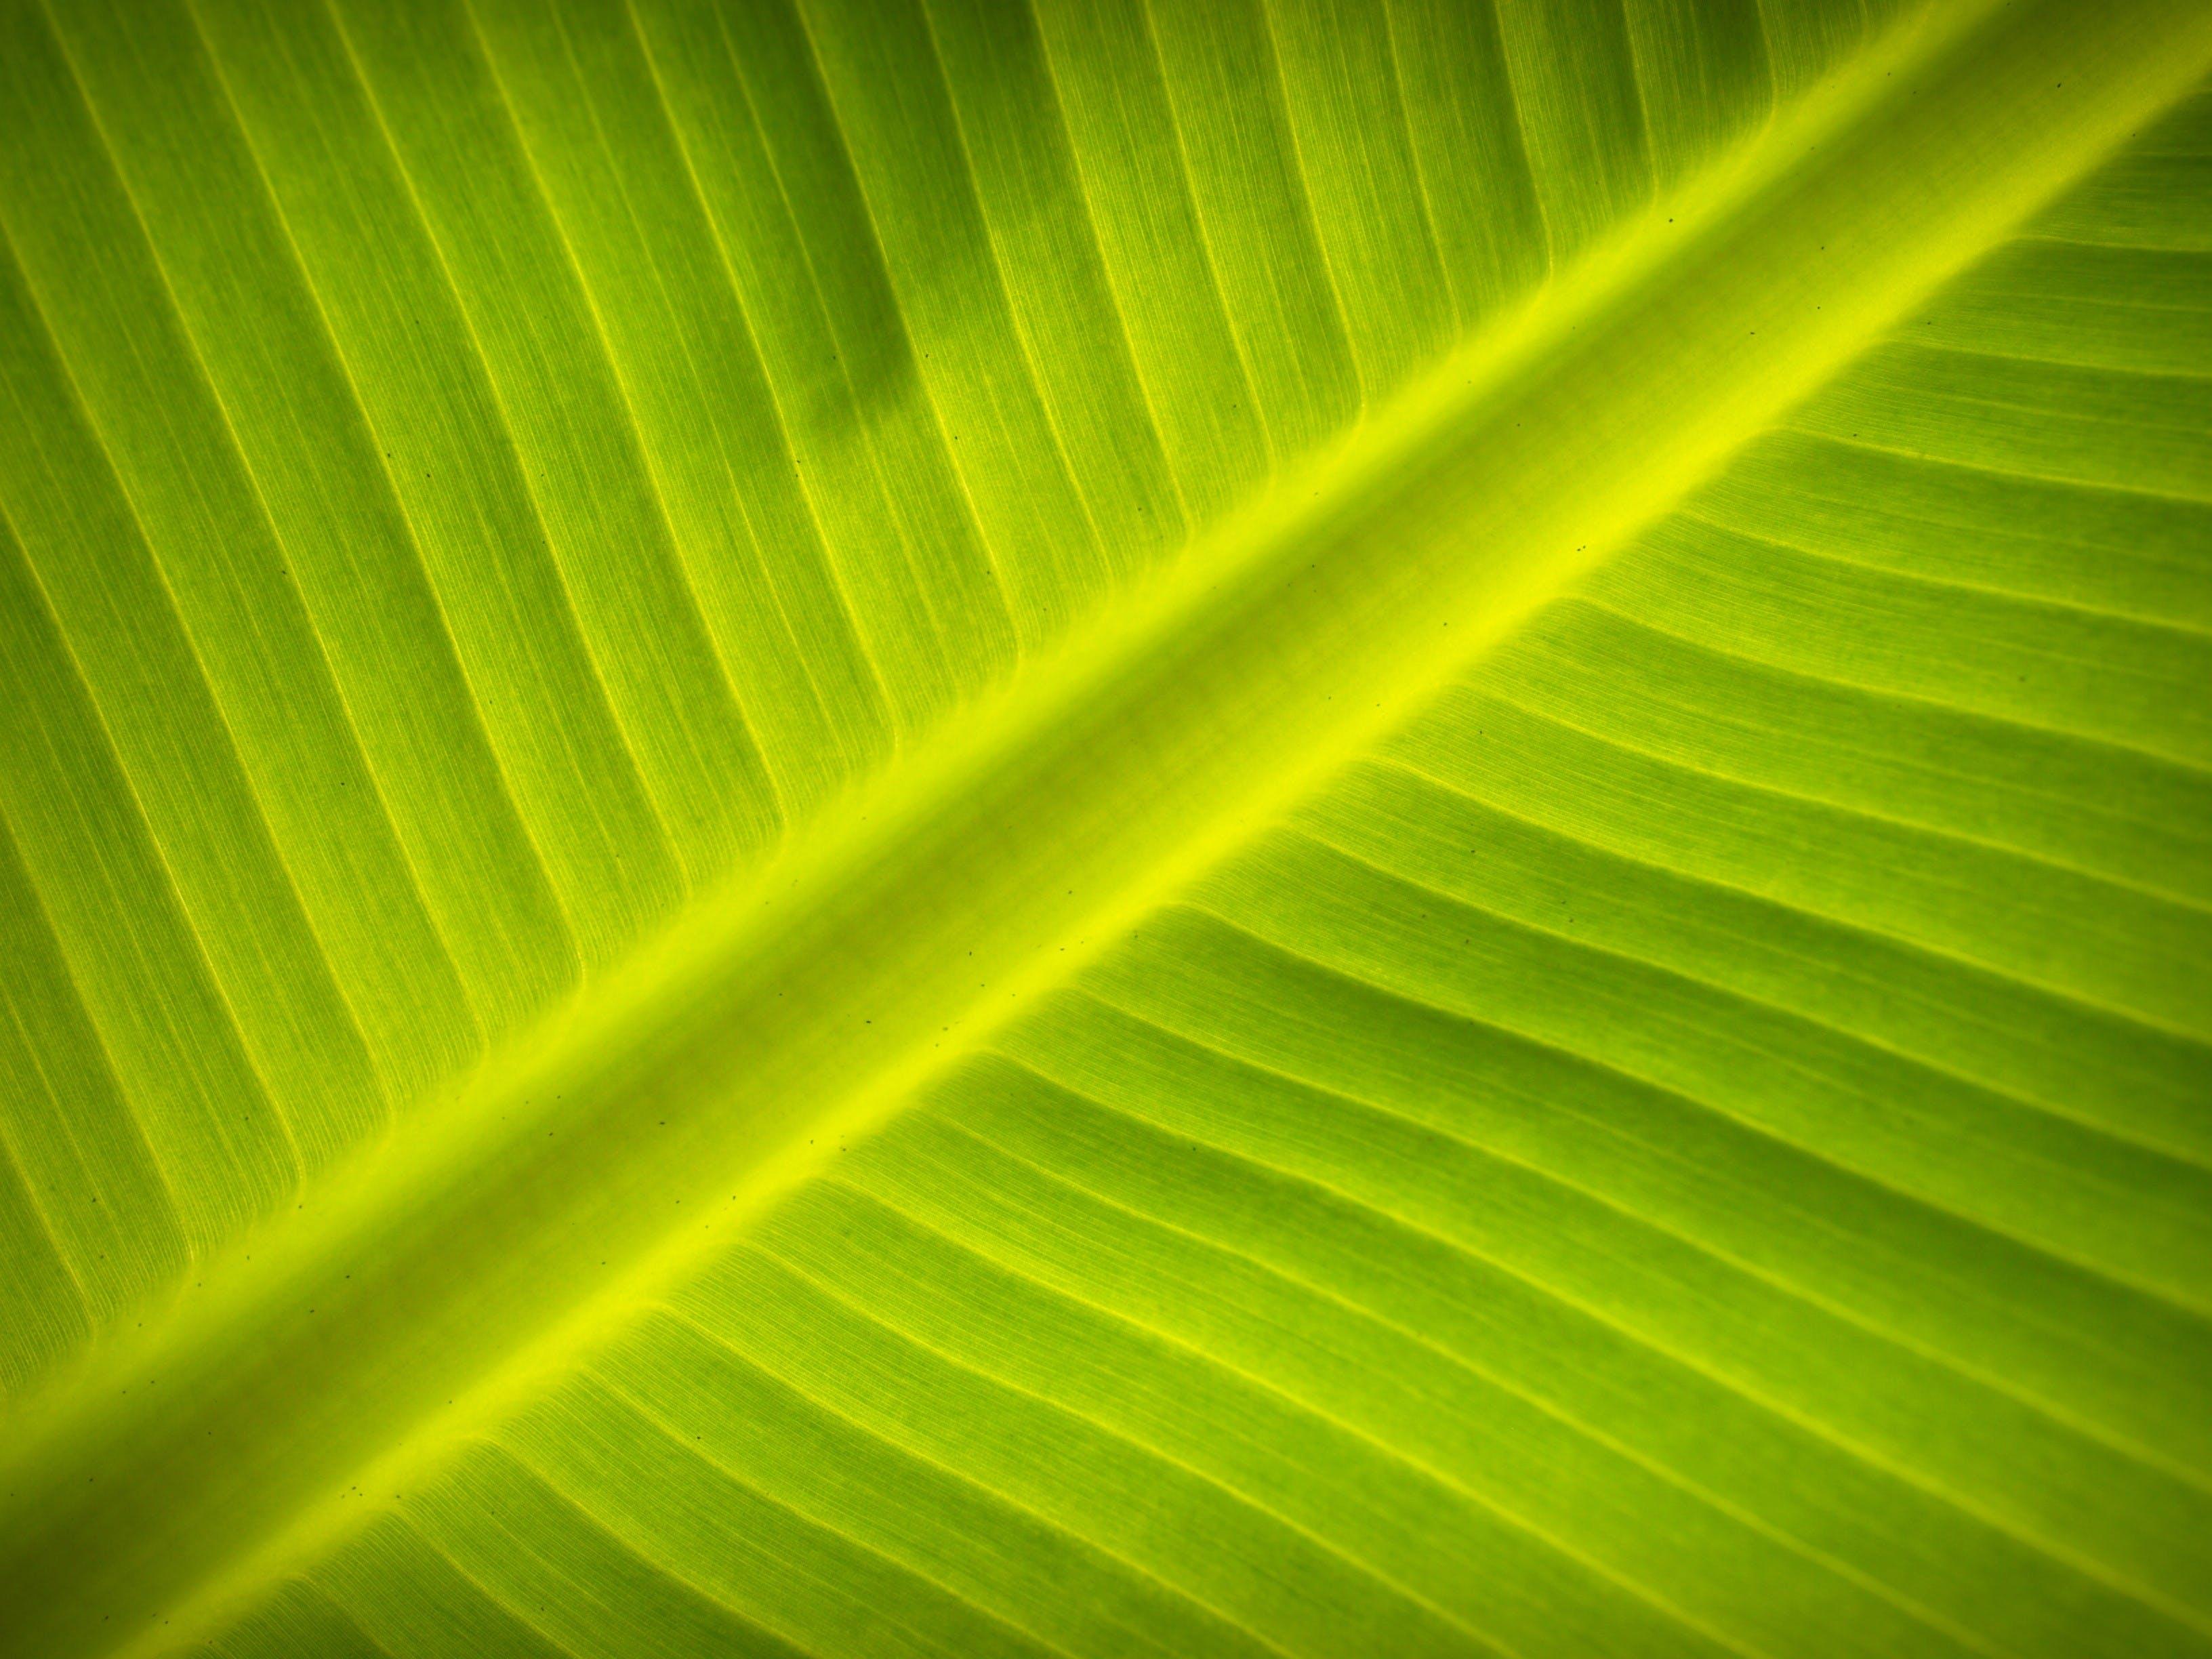 bananblad, grön, mönster